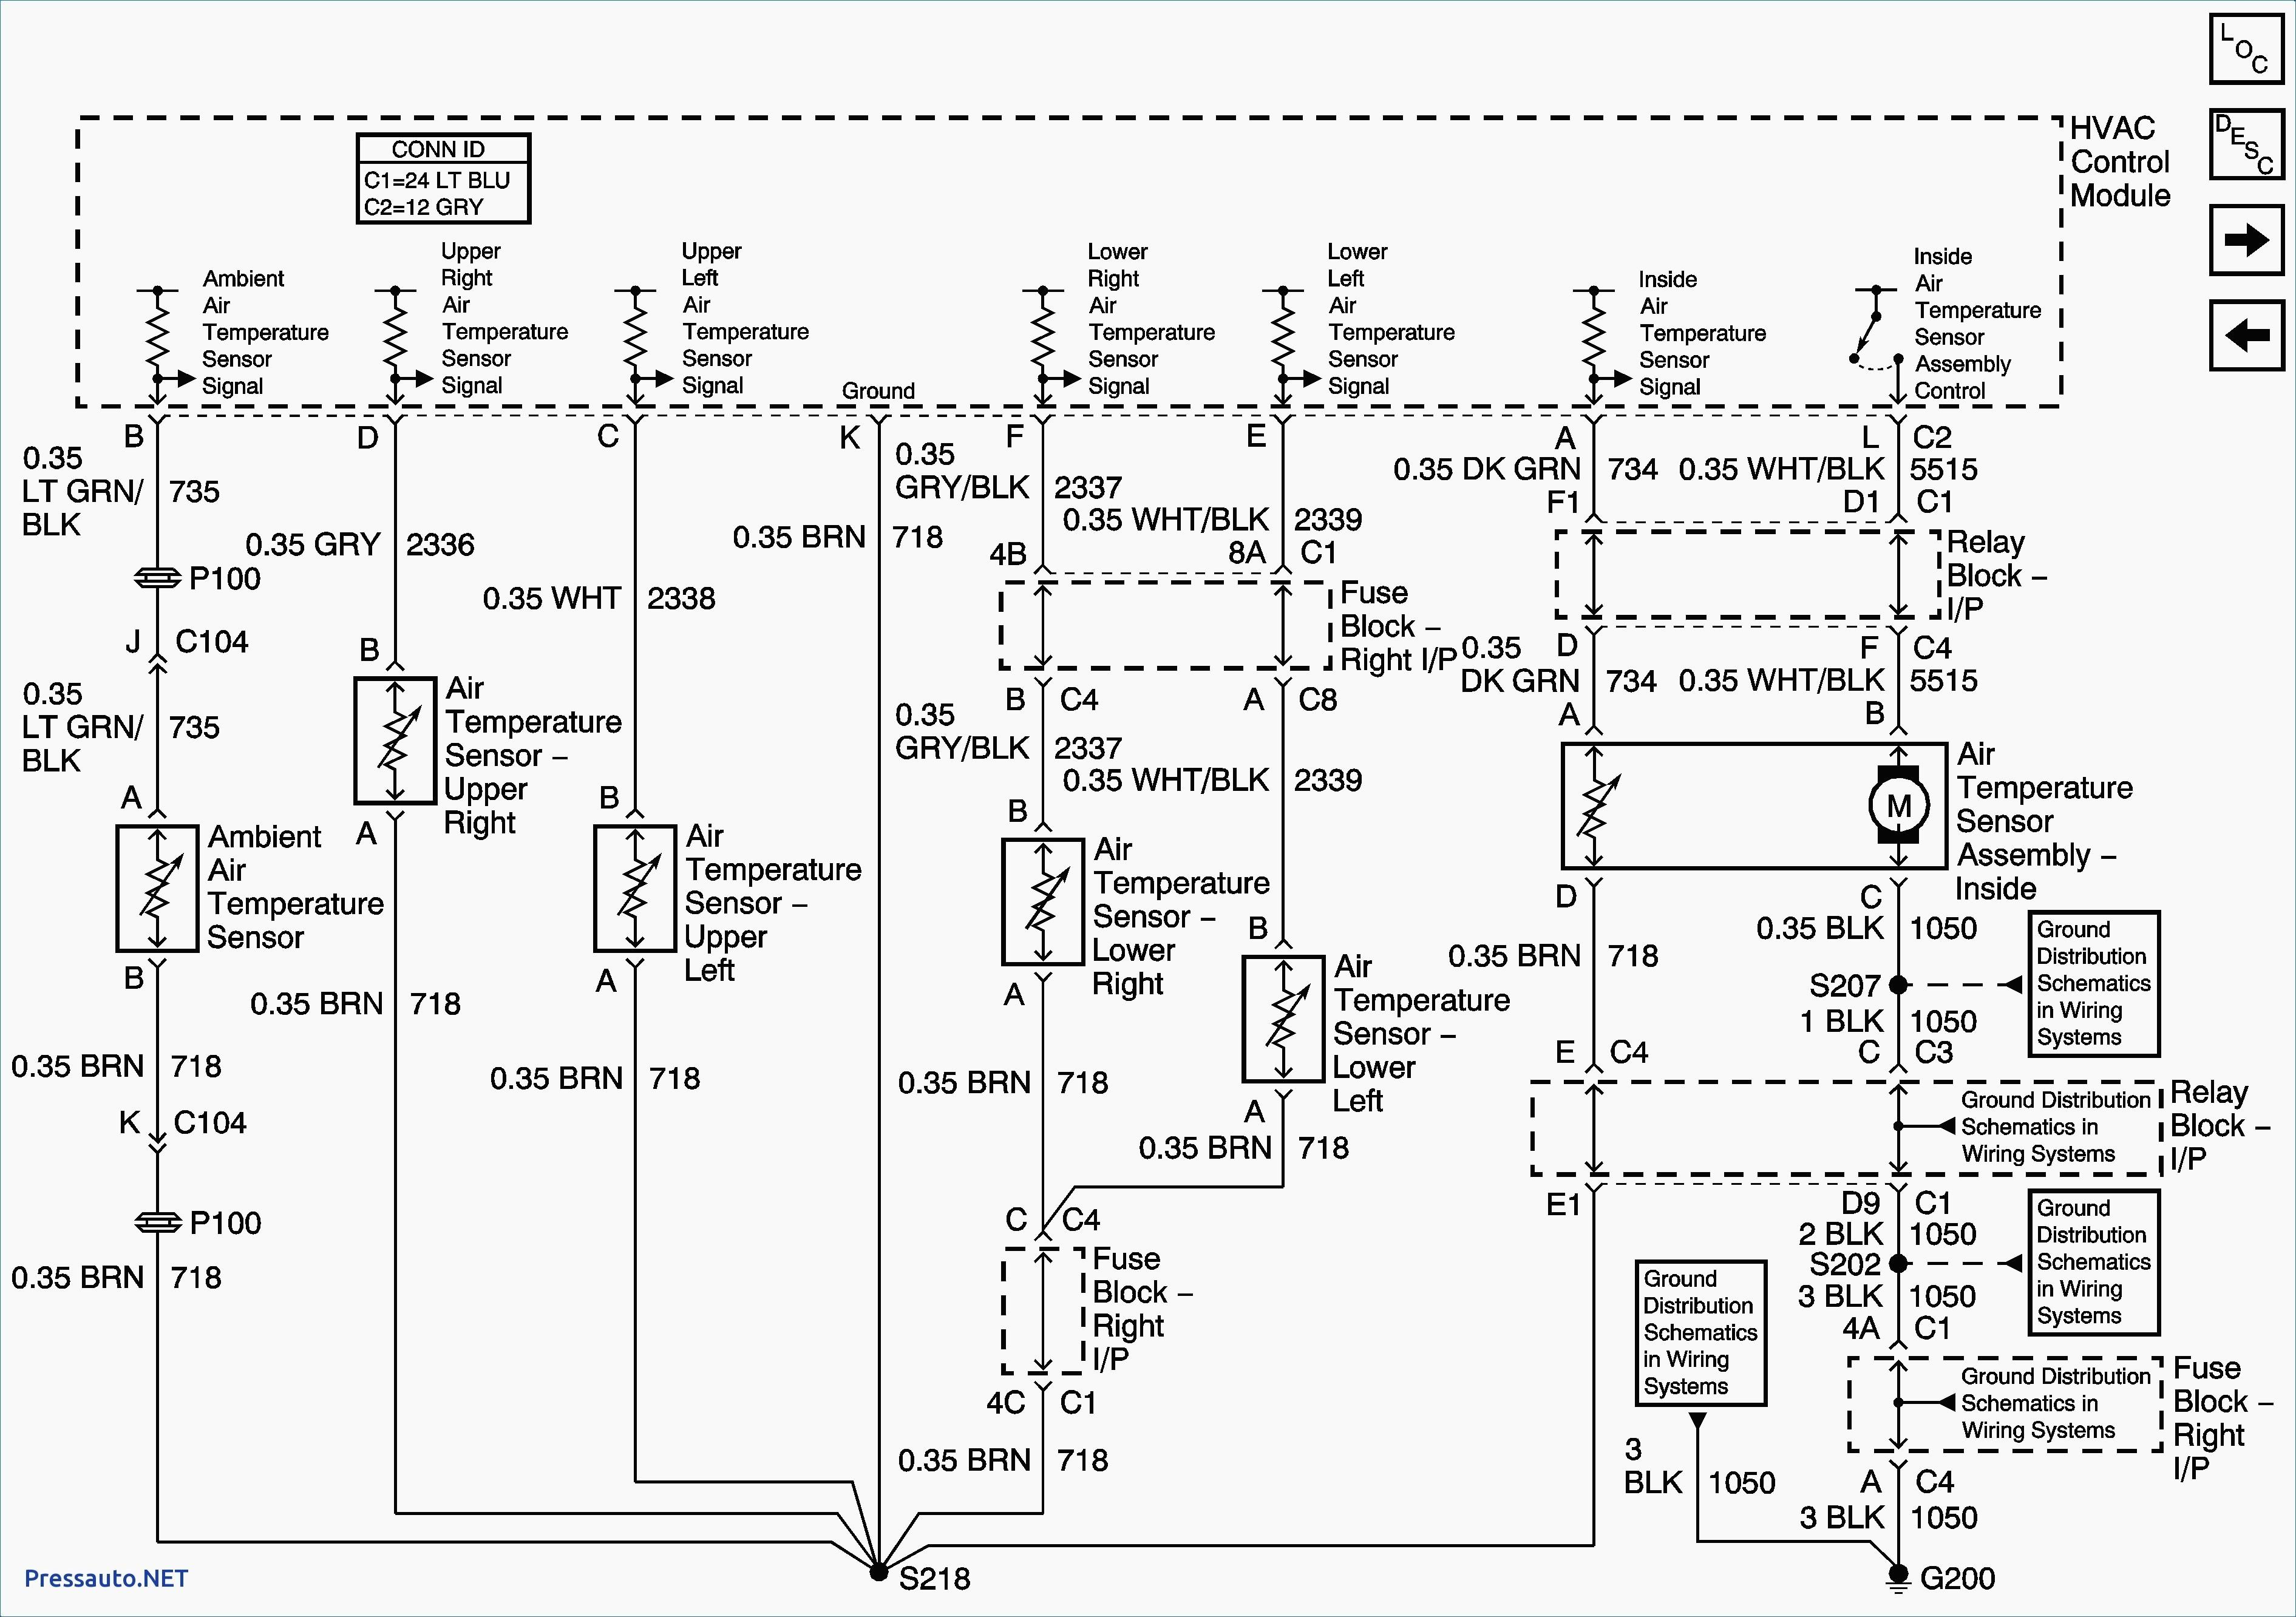 Chevy Tahoe Parts Diagram 2003 Chevrolet Tahoe Parts Diagram Trusted Wiring Diagrams • Of Chevy Tahoe Parts Diagram